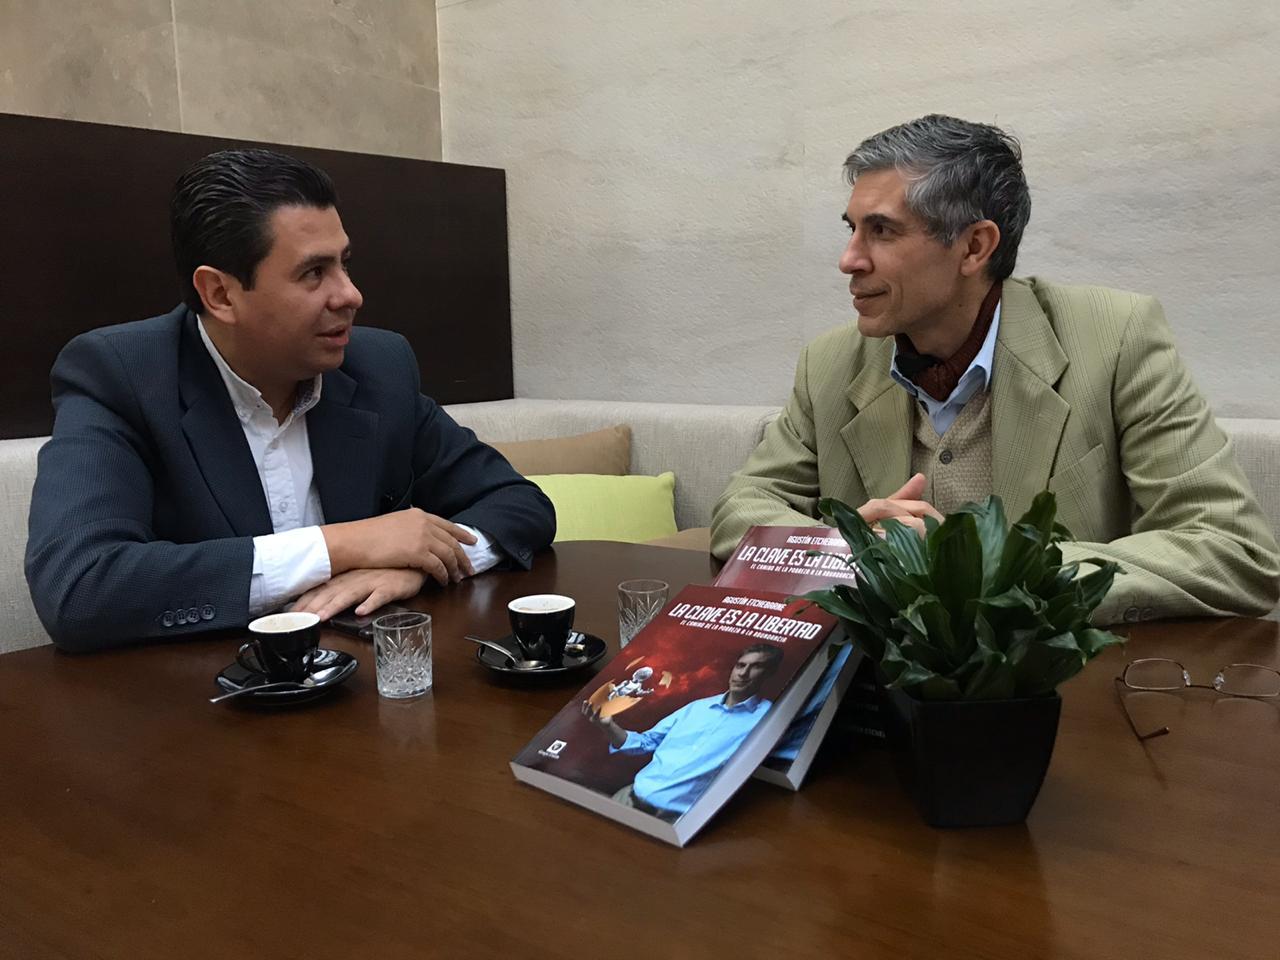 Economista argentino Agustin Etchebarne conversa sobre liberalismo en la economía latinoamericana